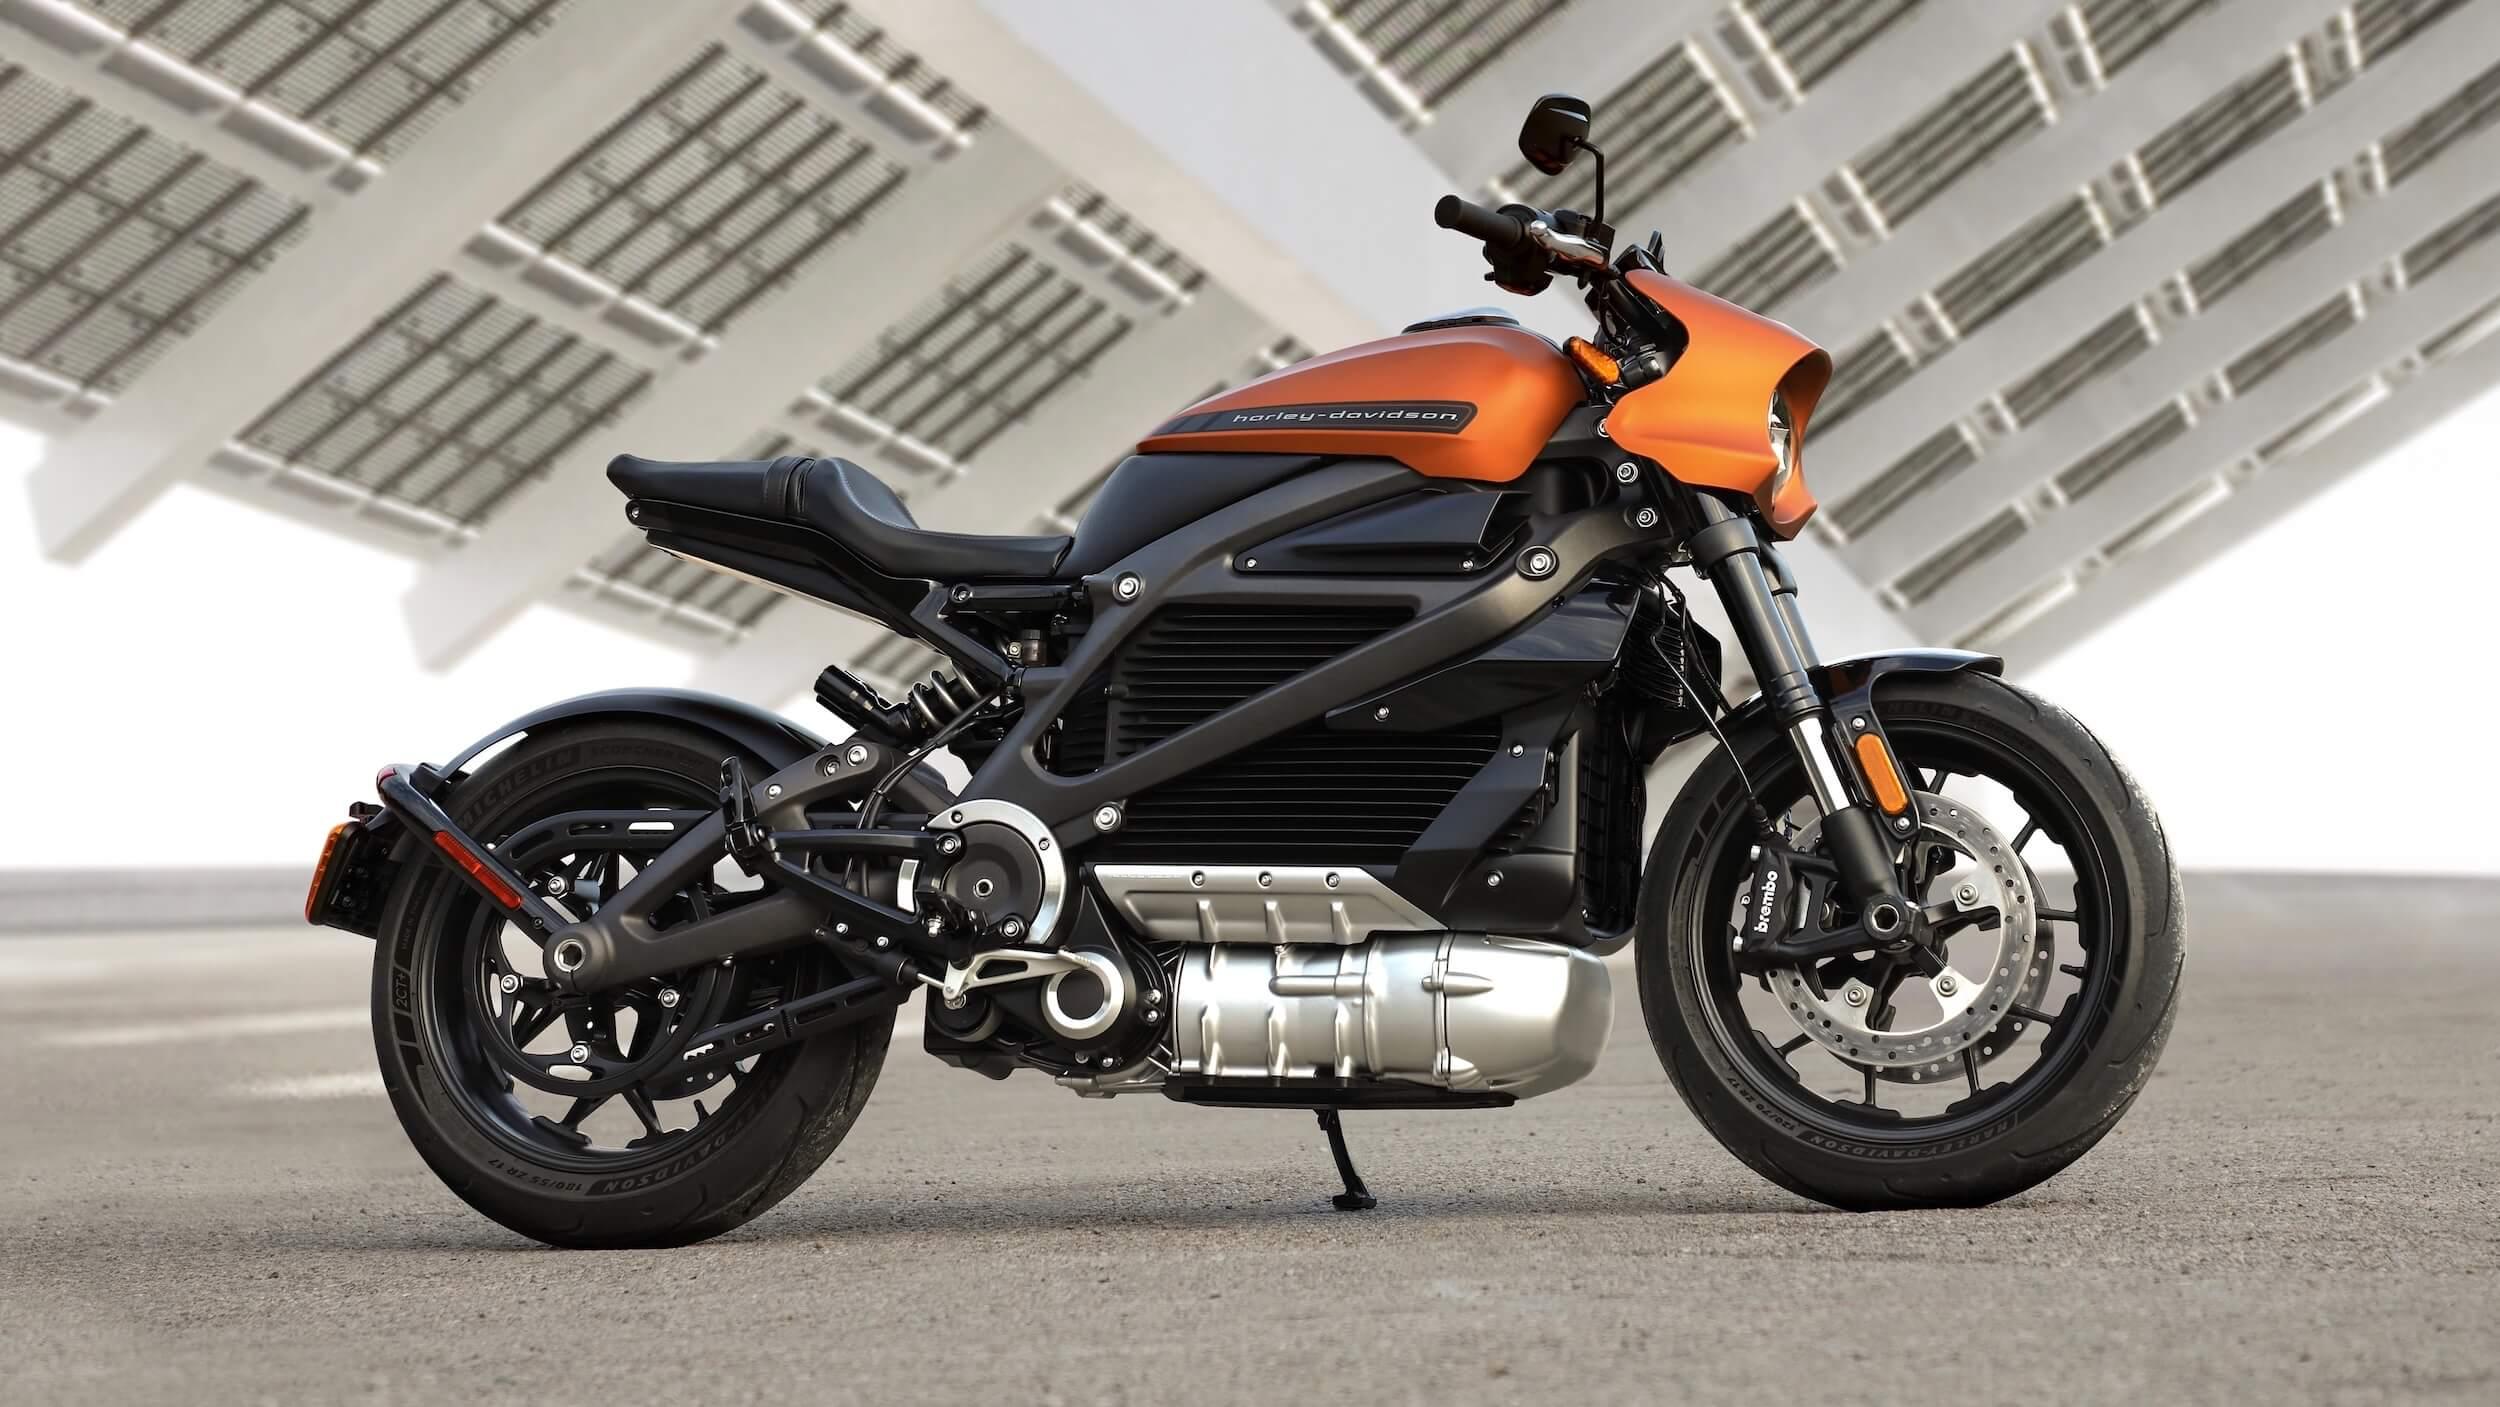 elektrische Harley Davidson 2020 oranje